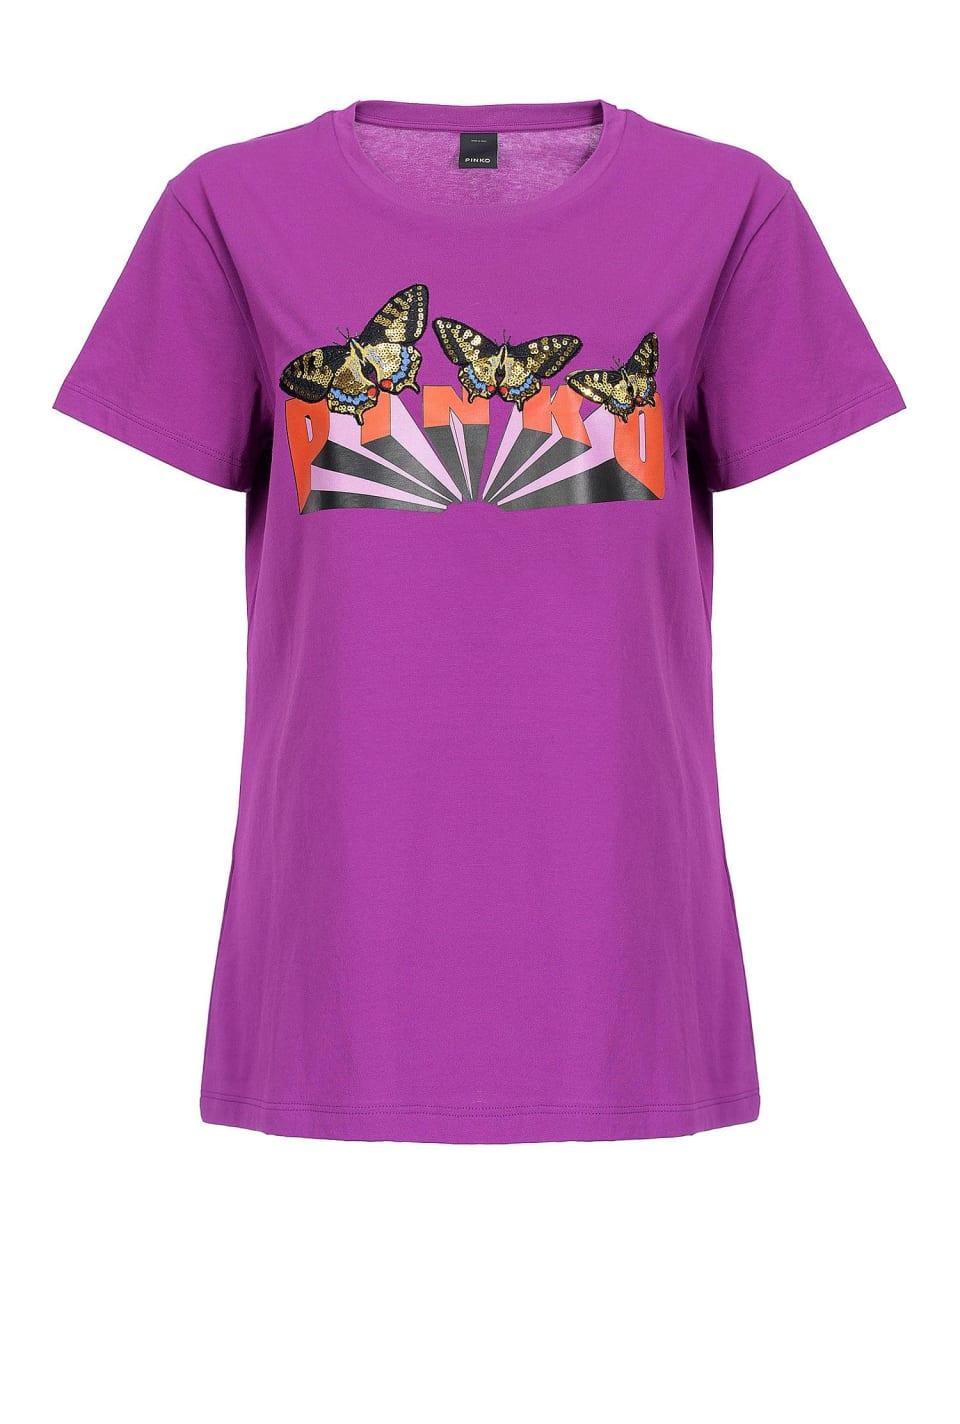 Camiseta con logotipo con mariposas